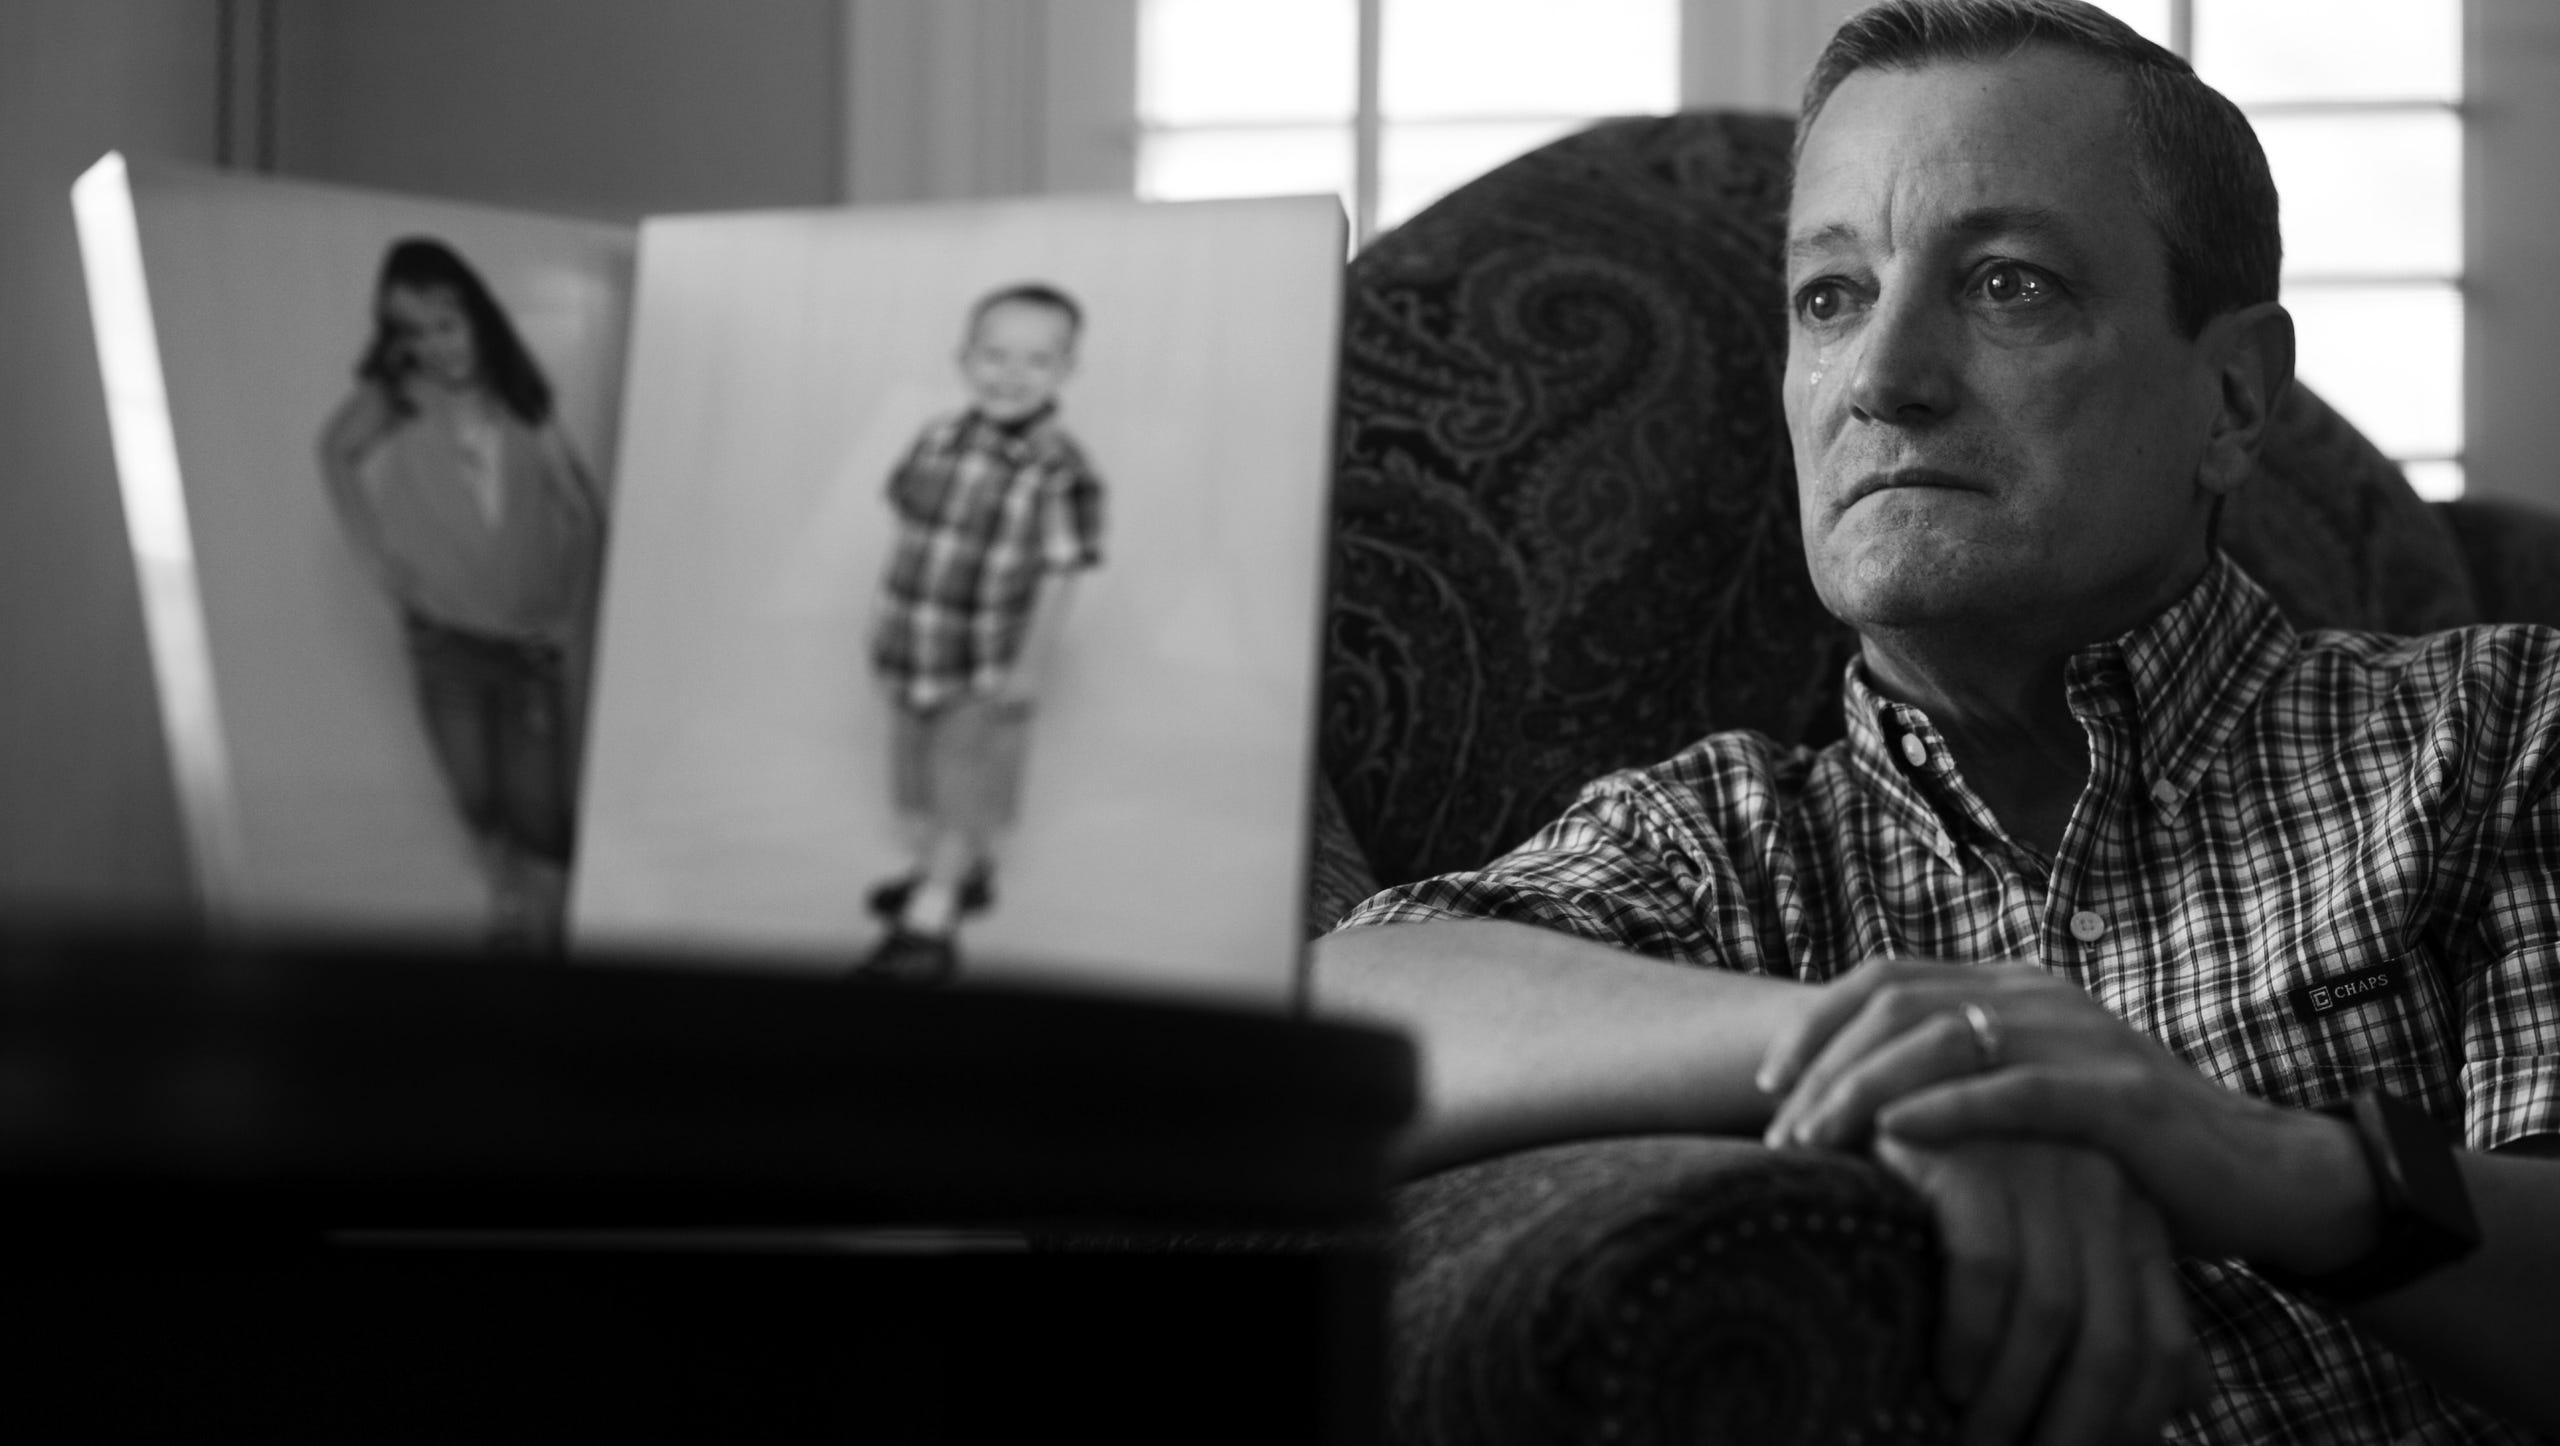 Faces of child welfare: Ken Pellerin: 'I've lost my